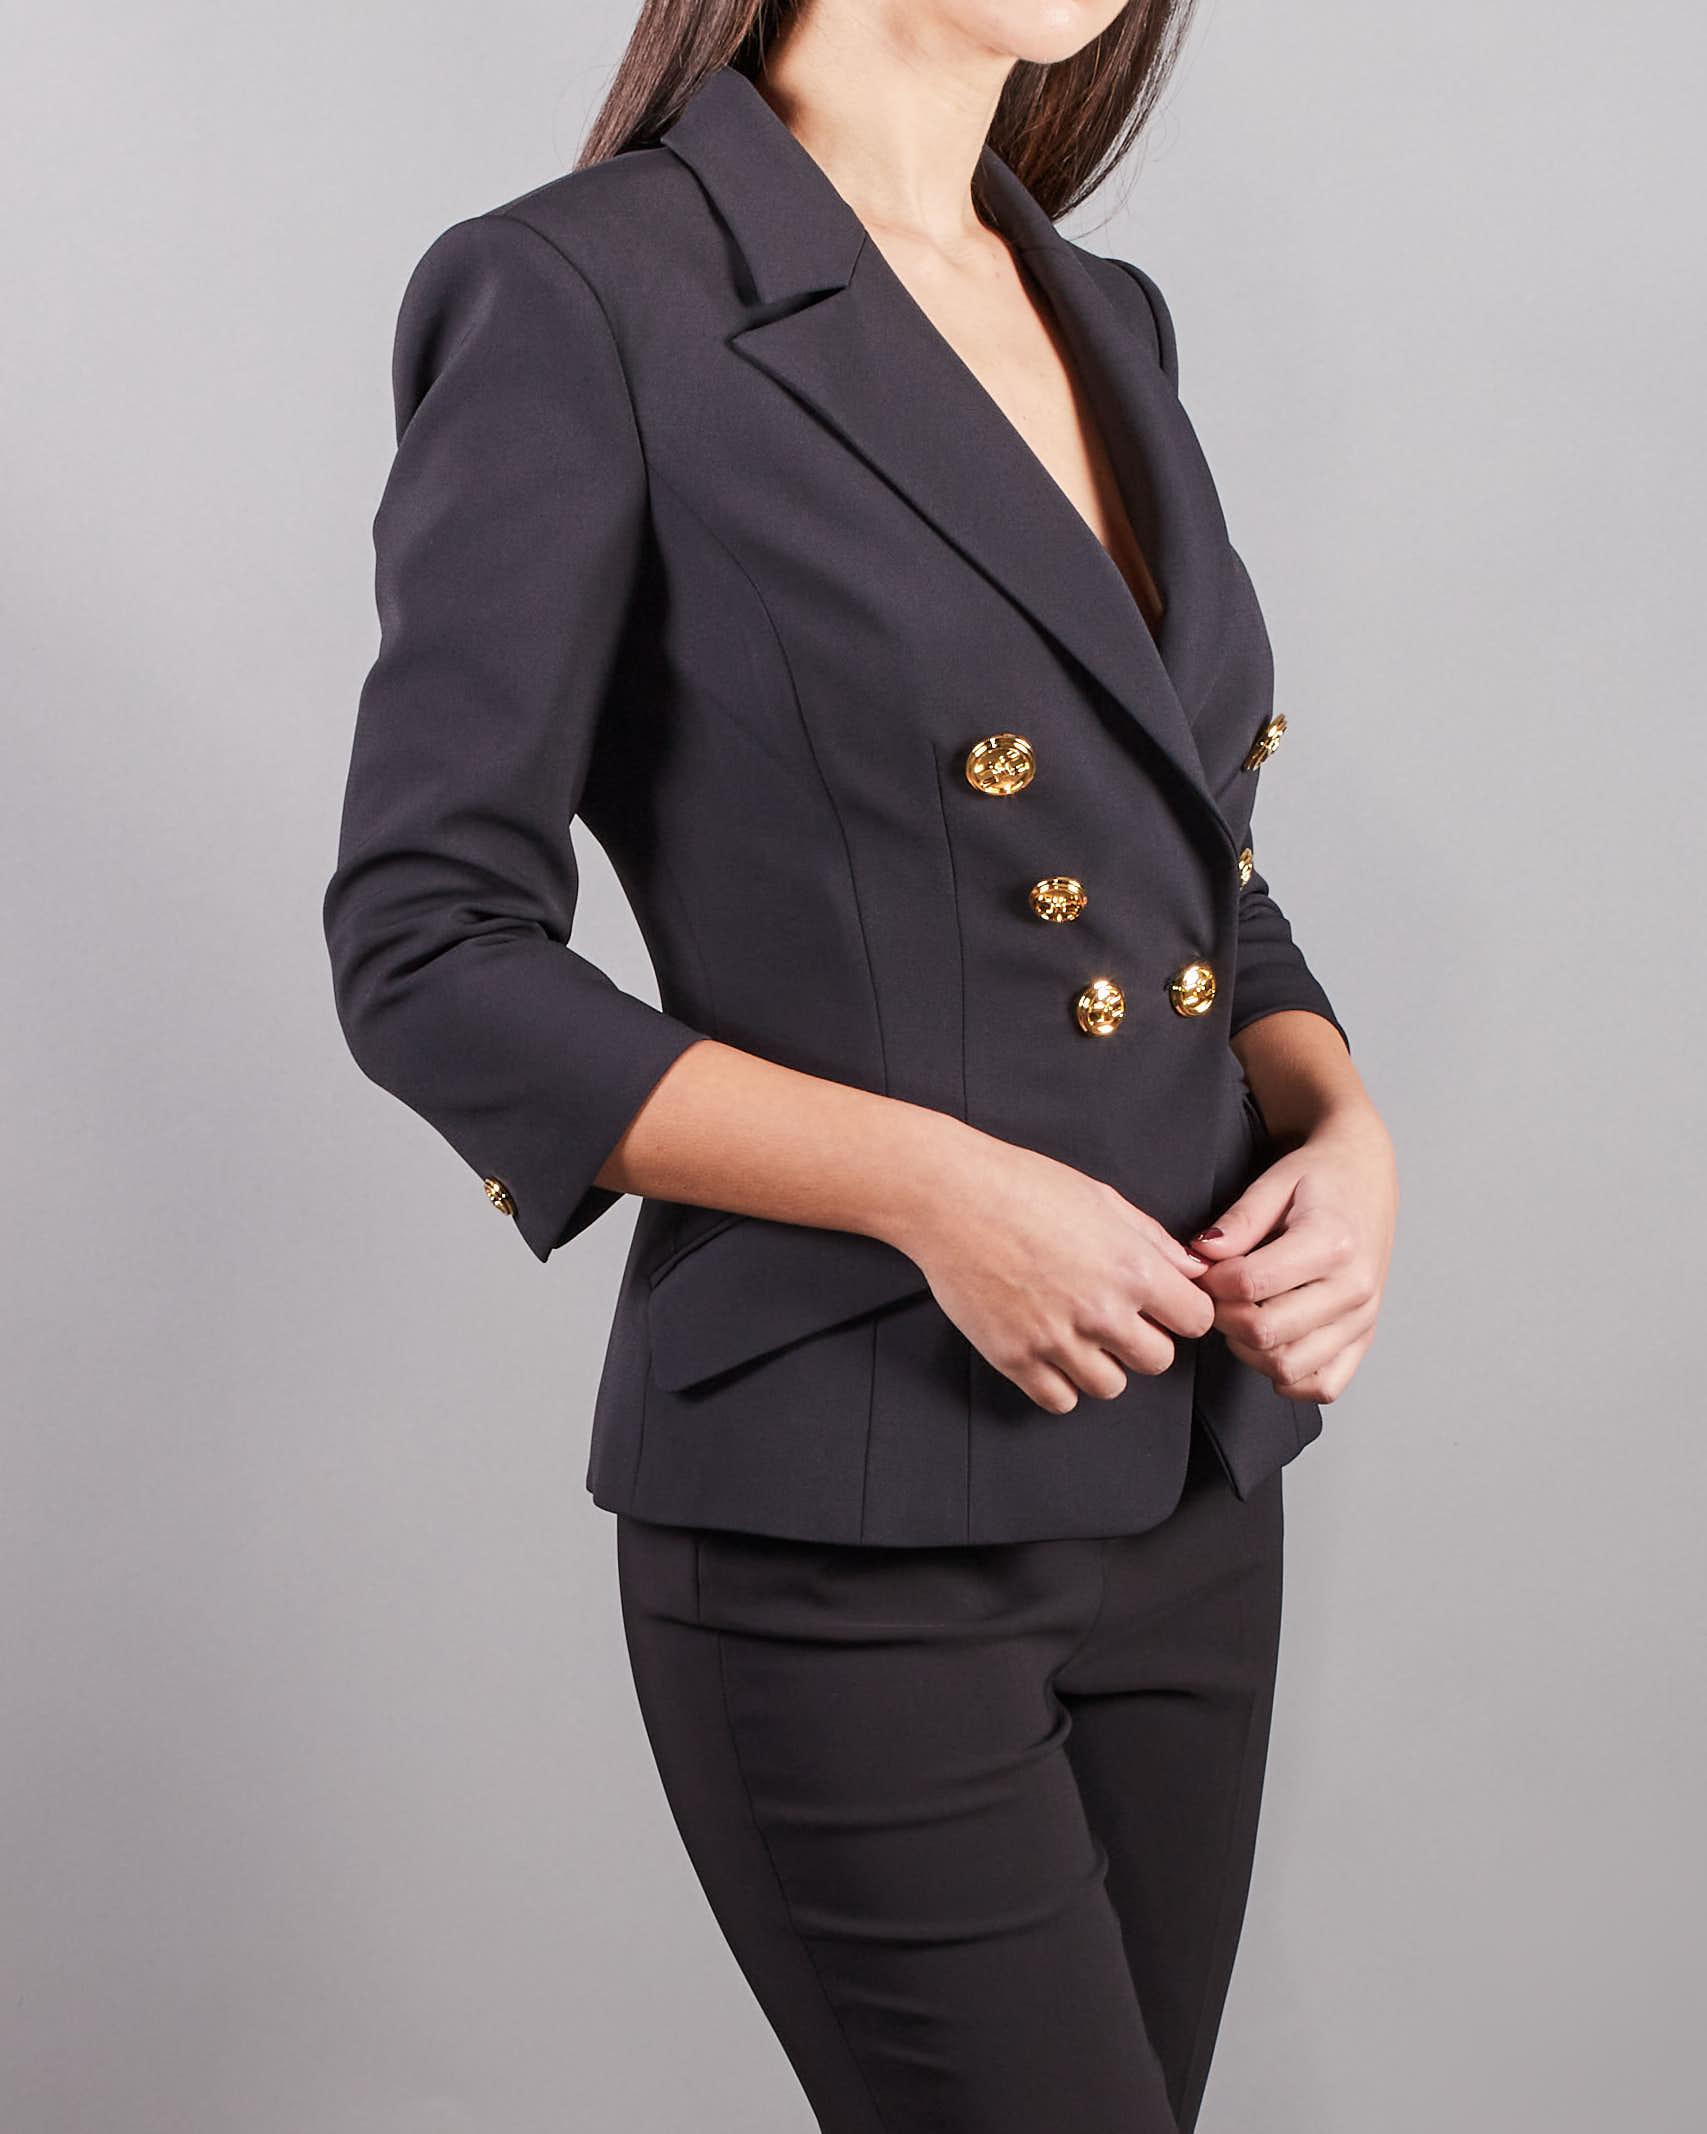 Giacca corta con bottoni oro light Elisabetta Franchi ELISABETTA FRANCHI   Giacca   GI97011E2110